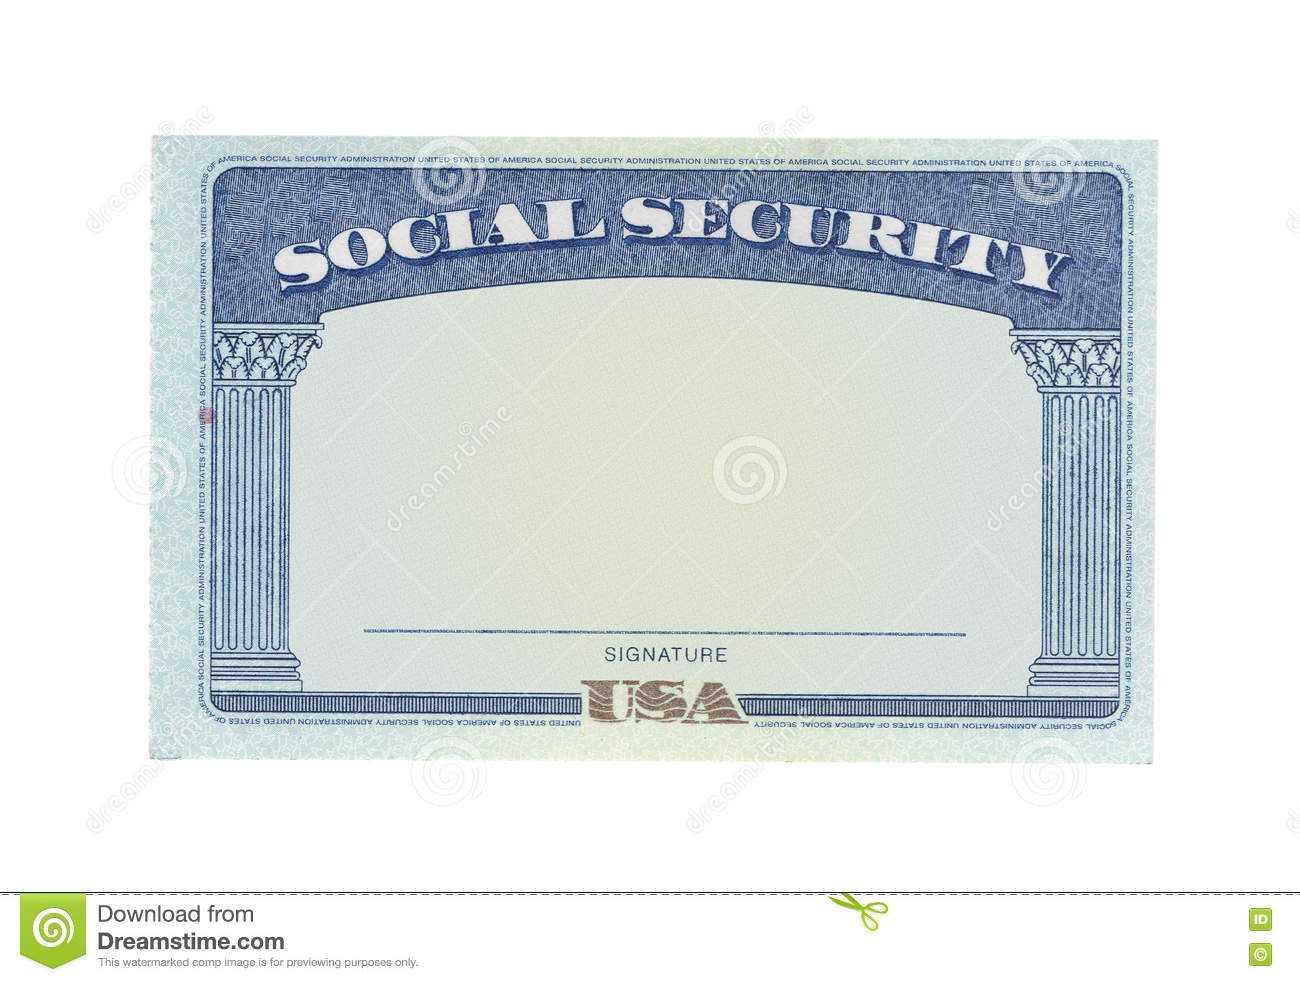 Blank Social Security Card Stock Photos - Download 127 With Regard To Blank Social Security Card Template Download